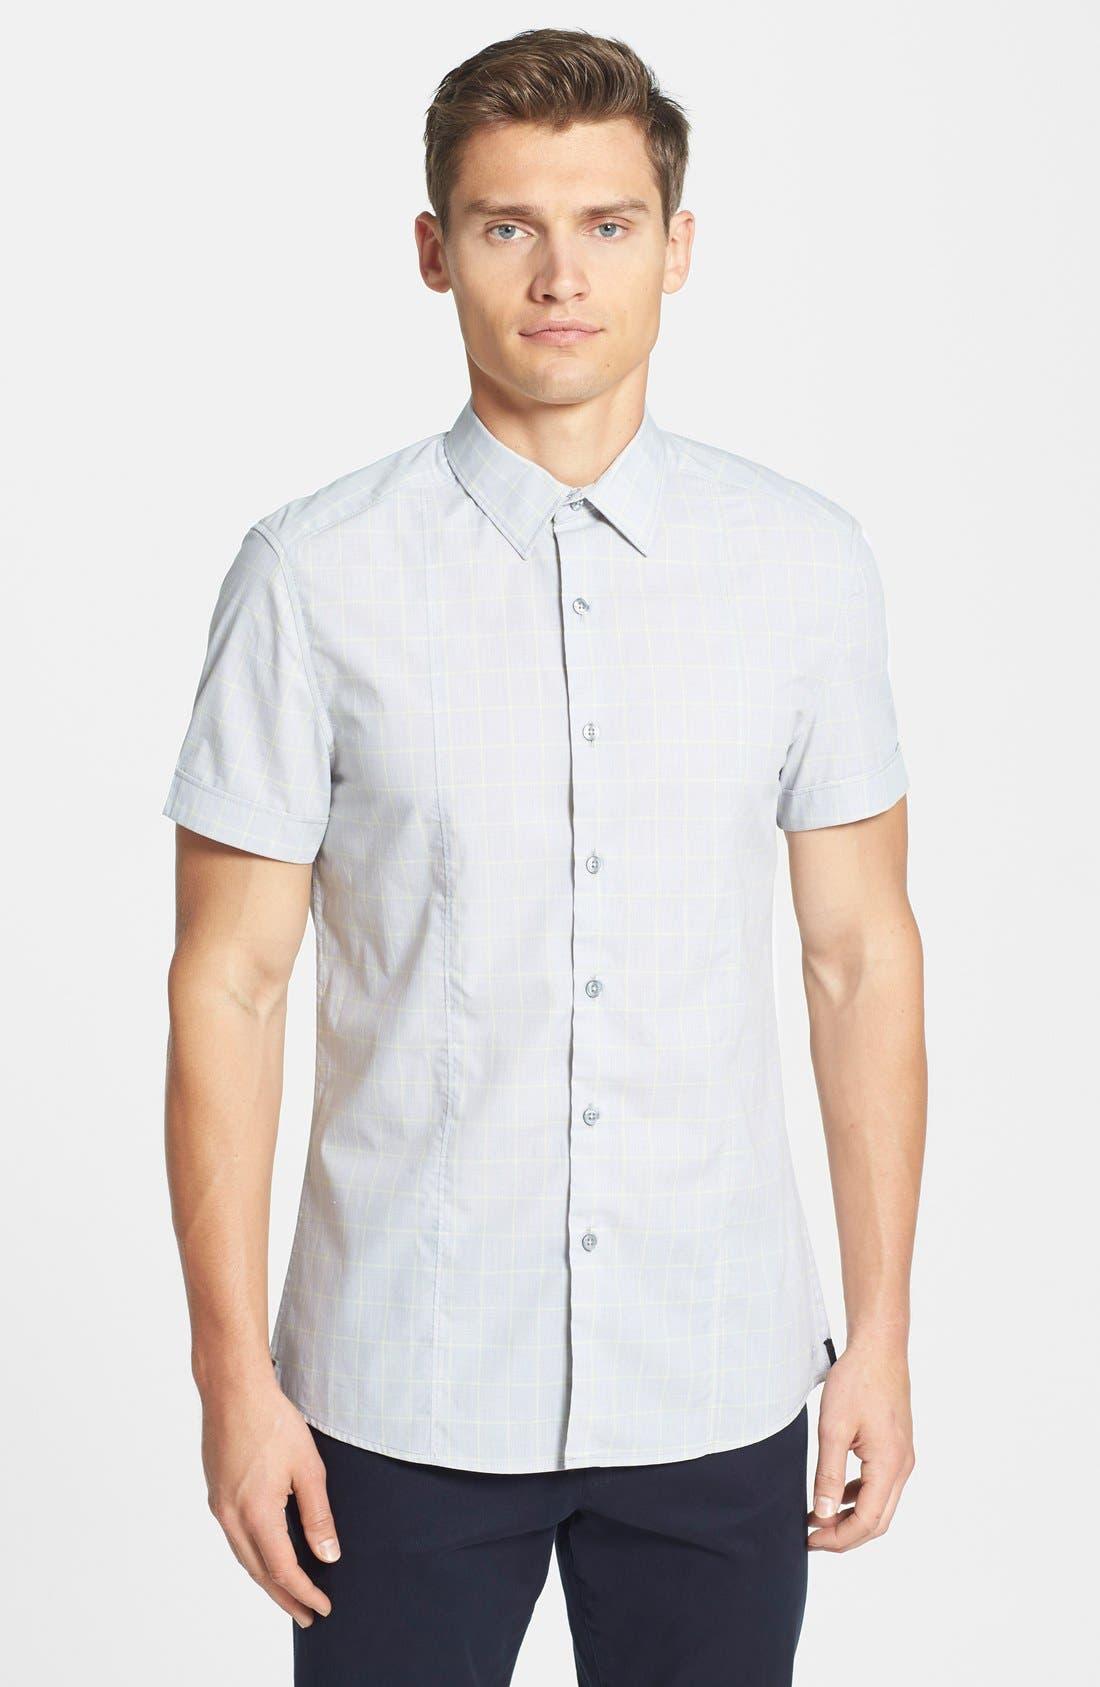 Main Image - Kenneth Cole New York Trim Fit Short Sleeve Windowpane Plaid Sport Shirt